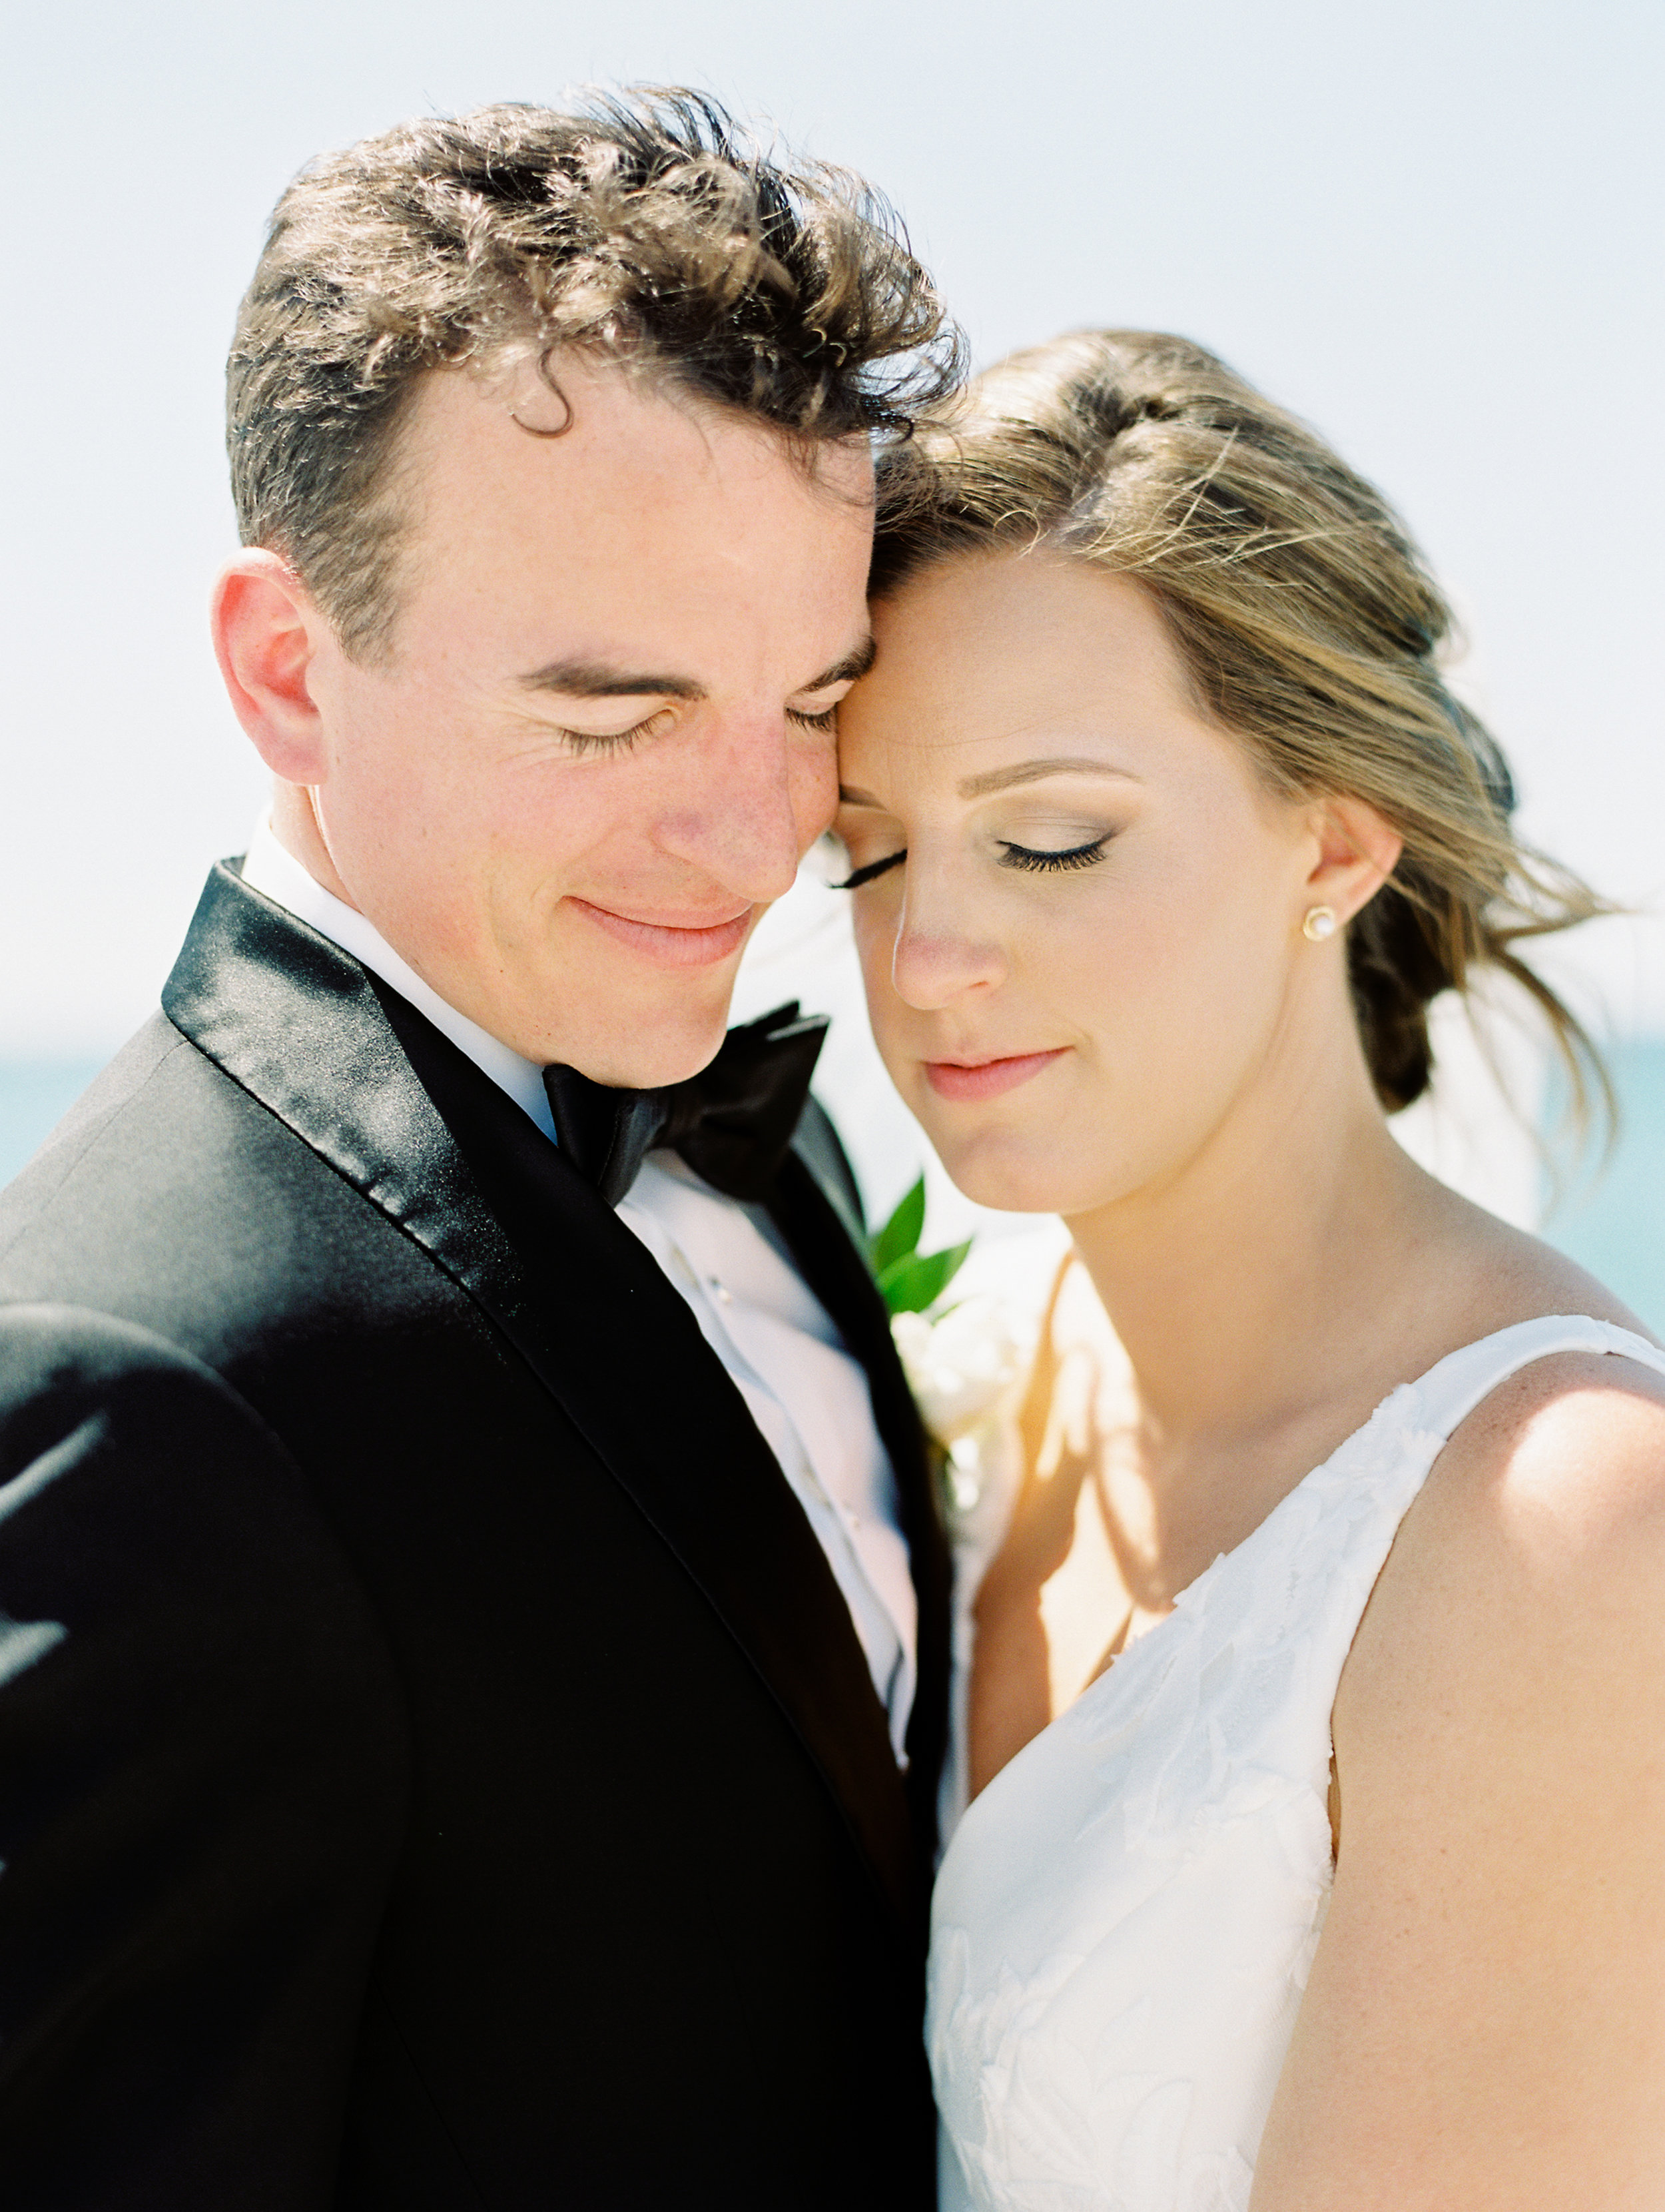 DeGuilio+Wedding+Bridal+Partyf-90.jpg